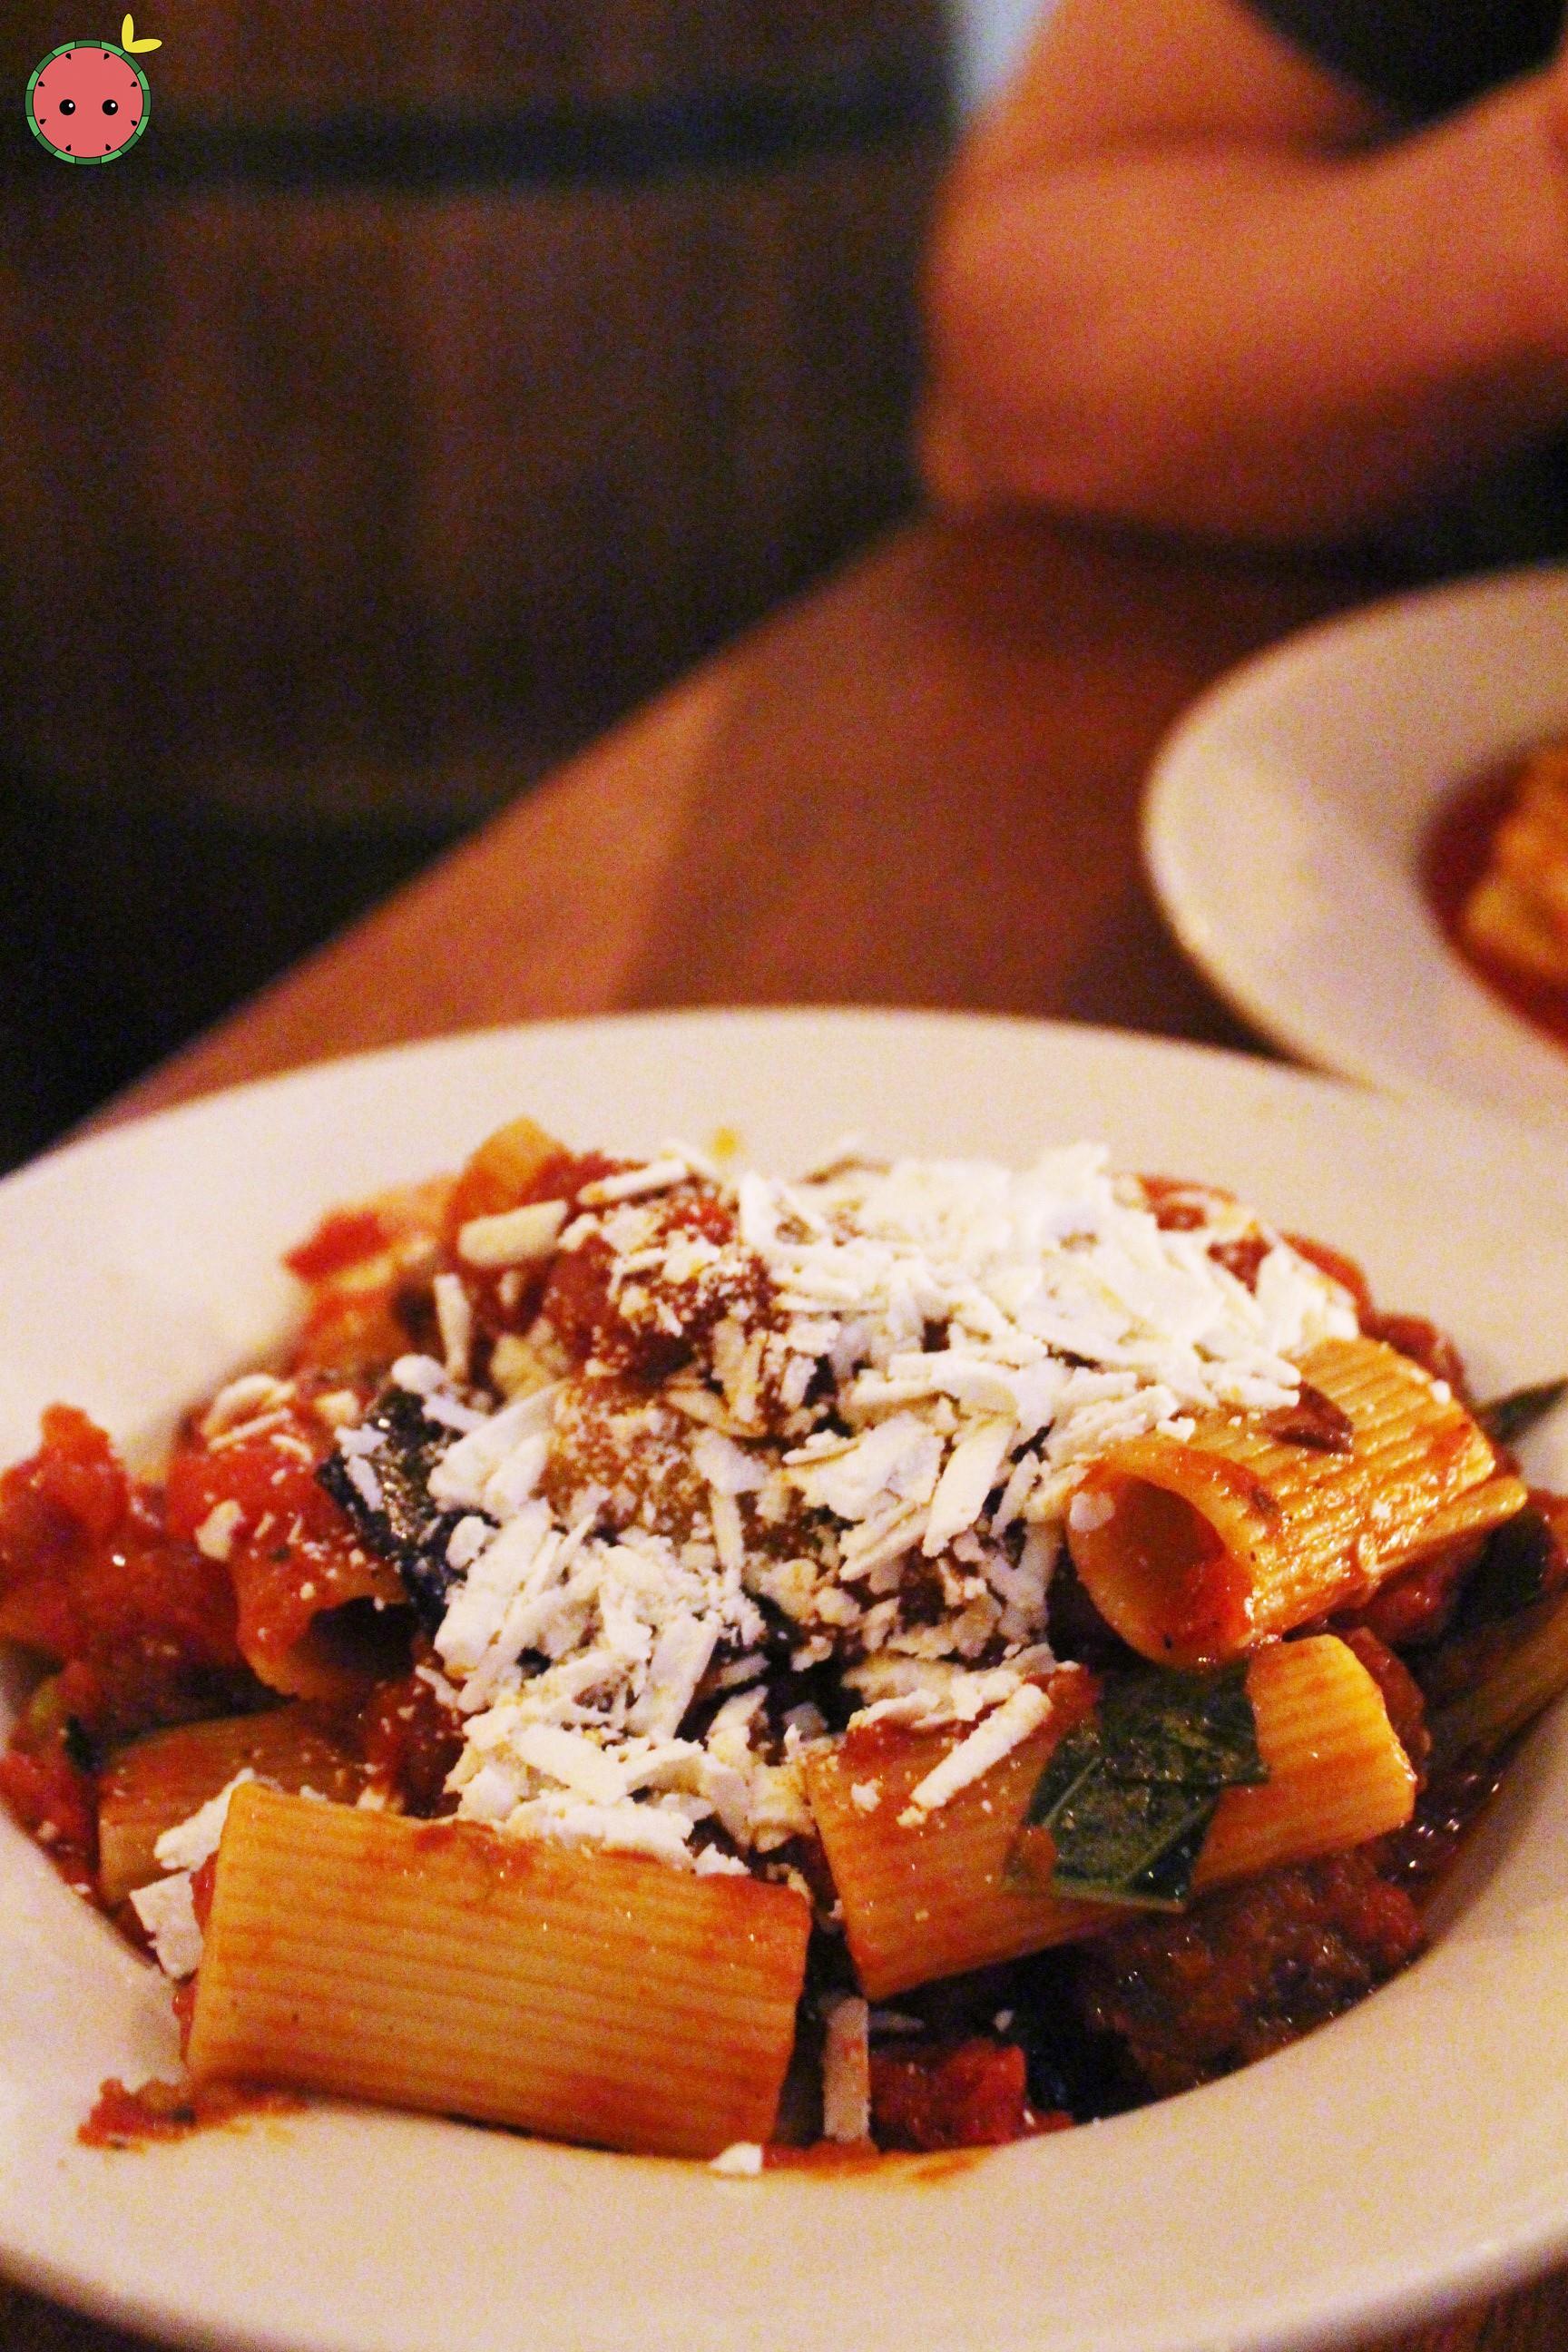 Rigatoni Norma Con Ricotta Salata - rigatoni with fresh tomatoes, eggplant & salted ricotta